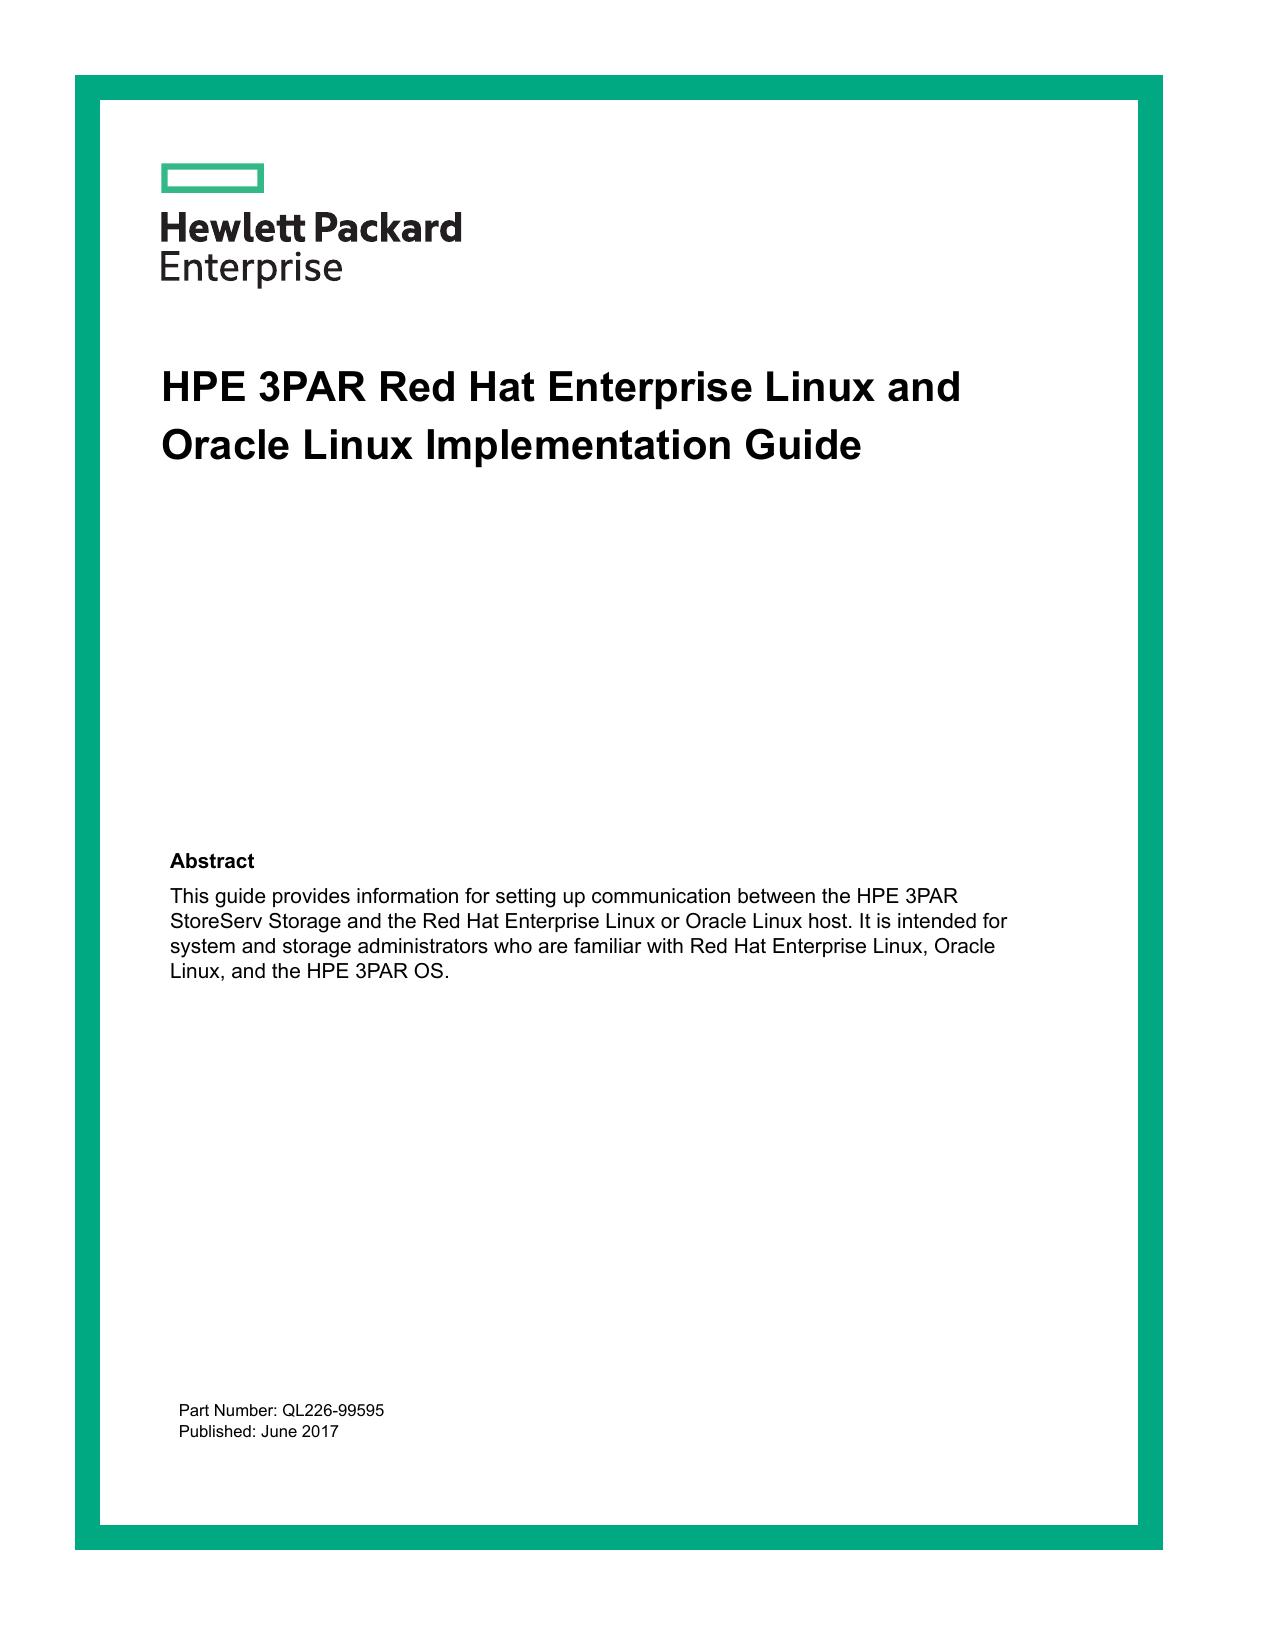 HPE 3PAR Red Hat Enterprise Linux and Oracle Linux